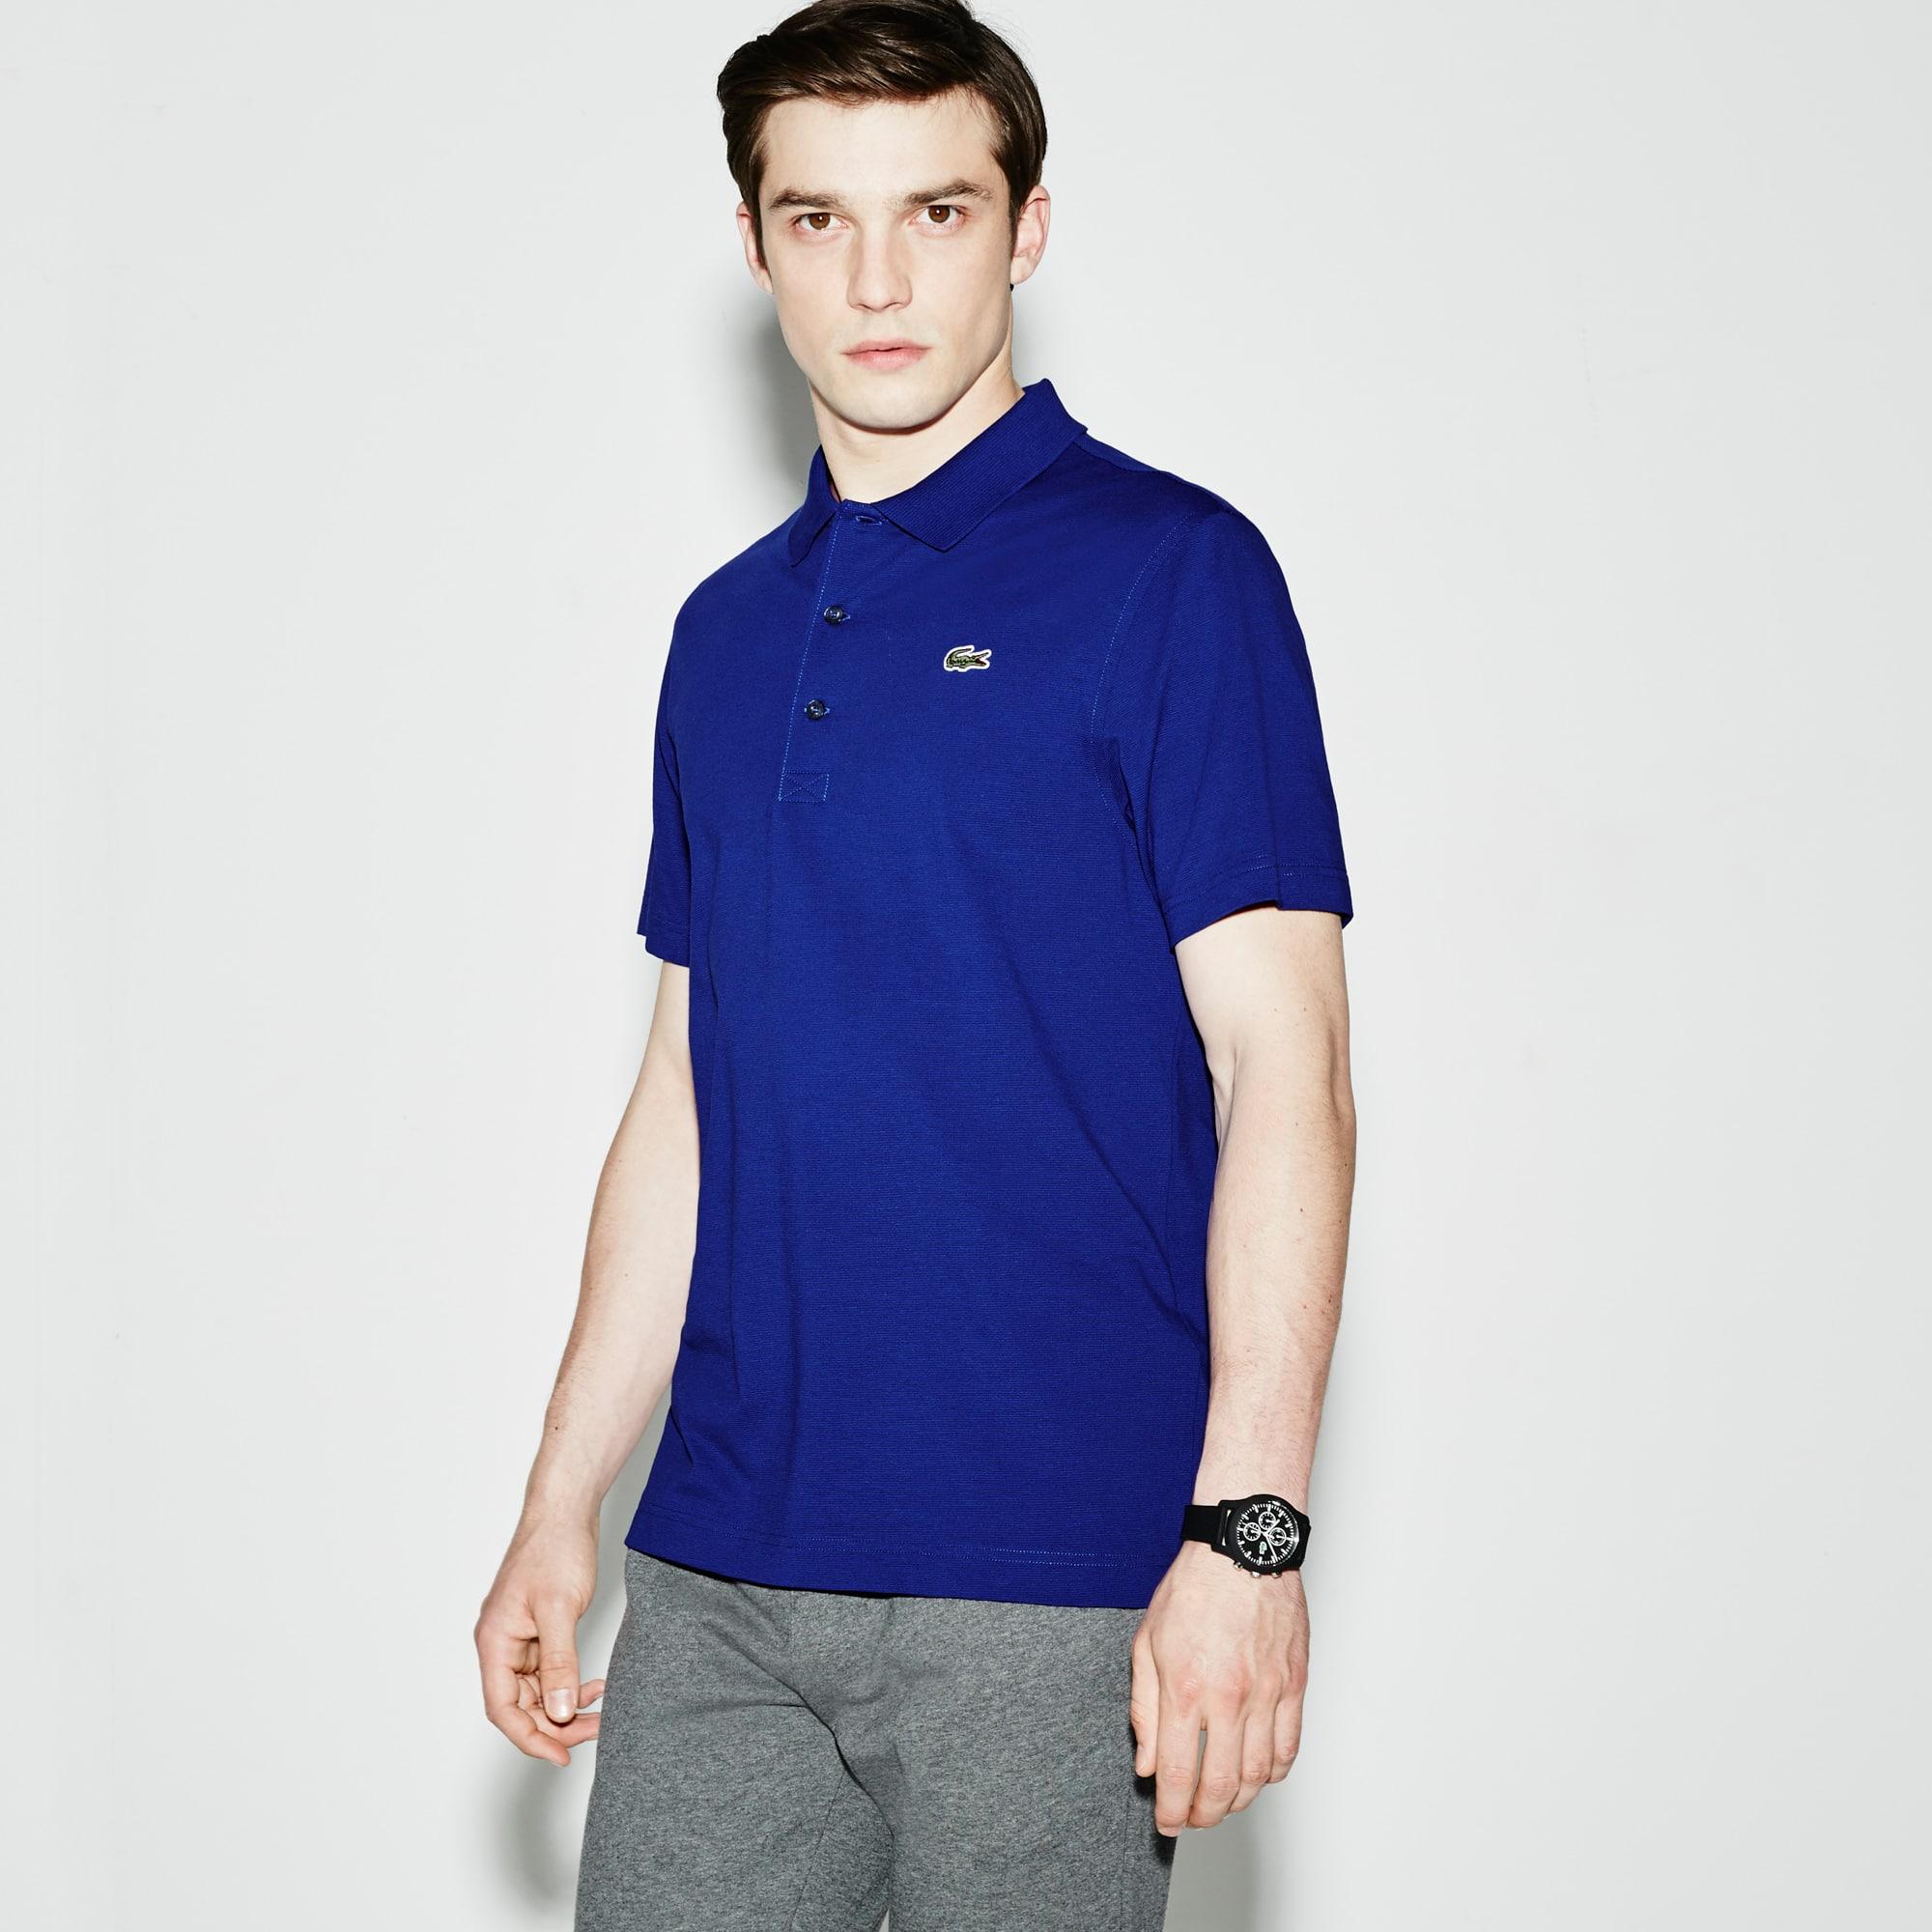 Polo Lacoste SPORT de tênis regular fit masculina em malha ultraleve